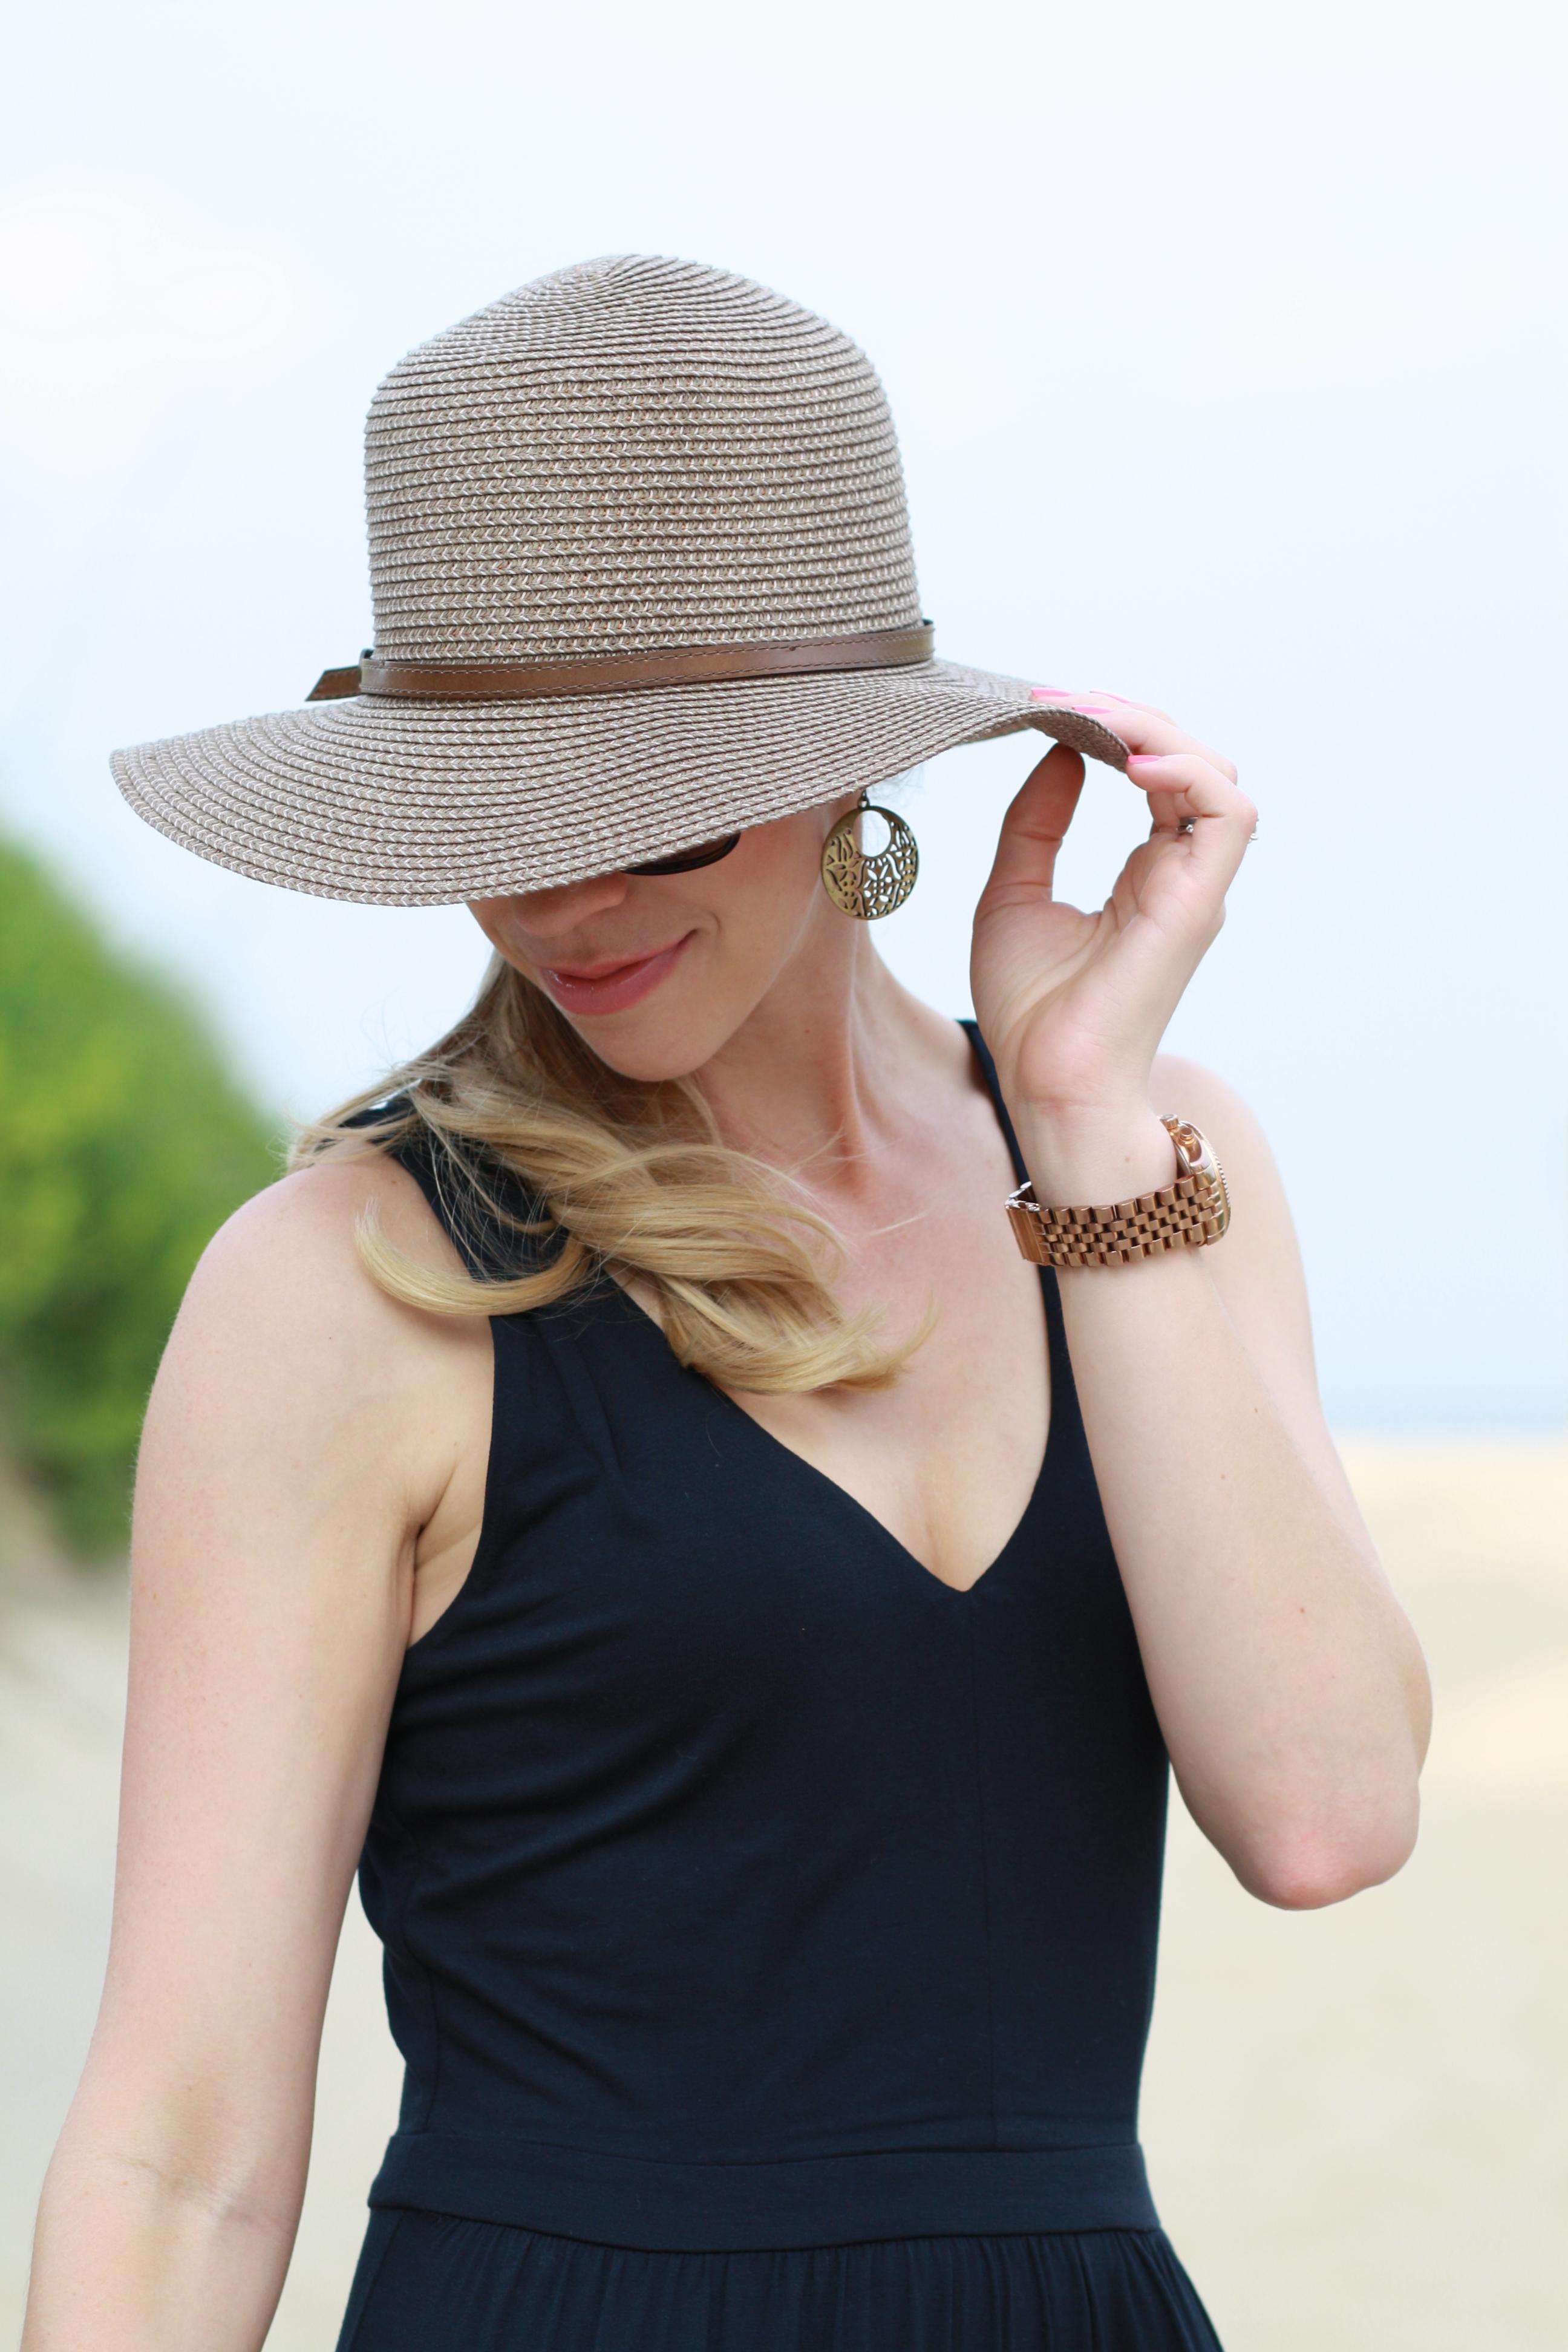 Peekaboo Maxi Dress Wedge Sandals Amp Floppy Straw Hat